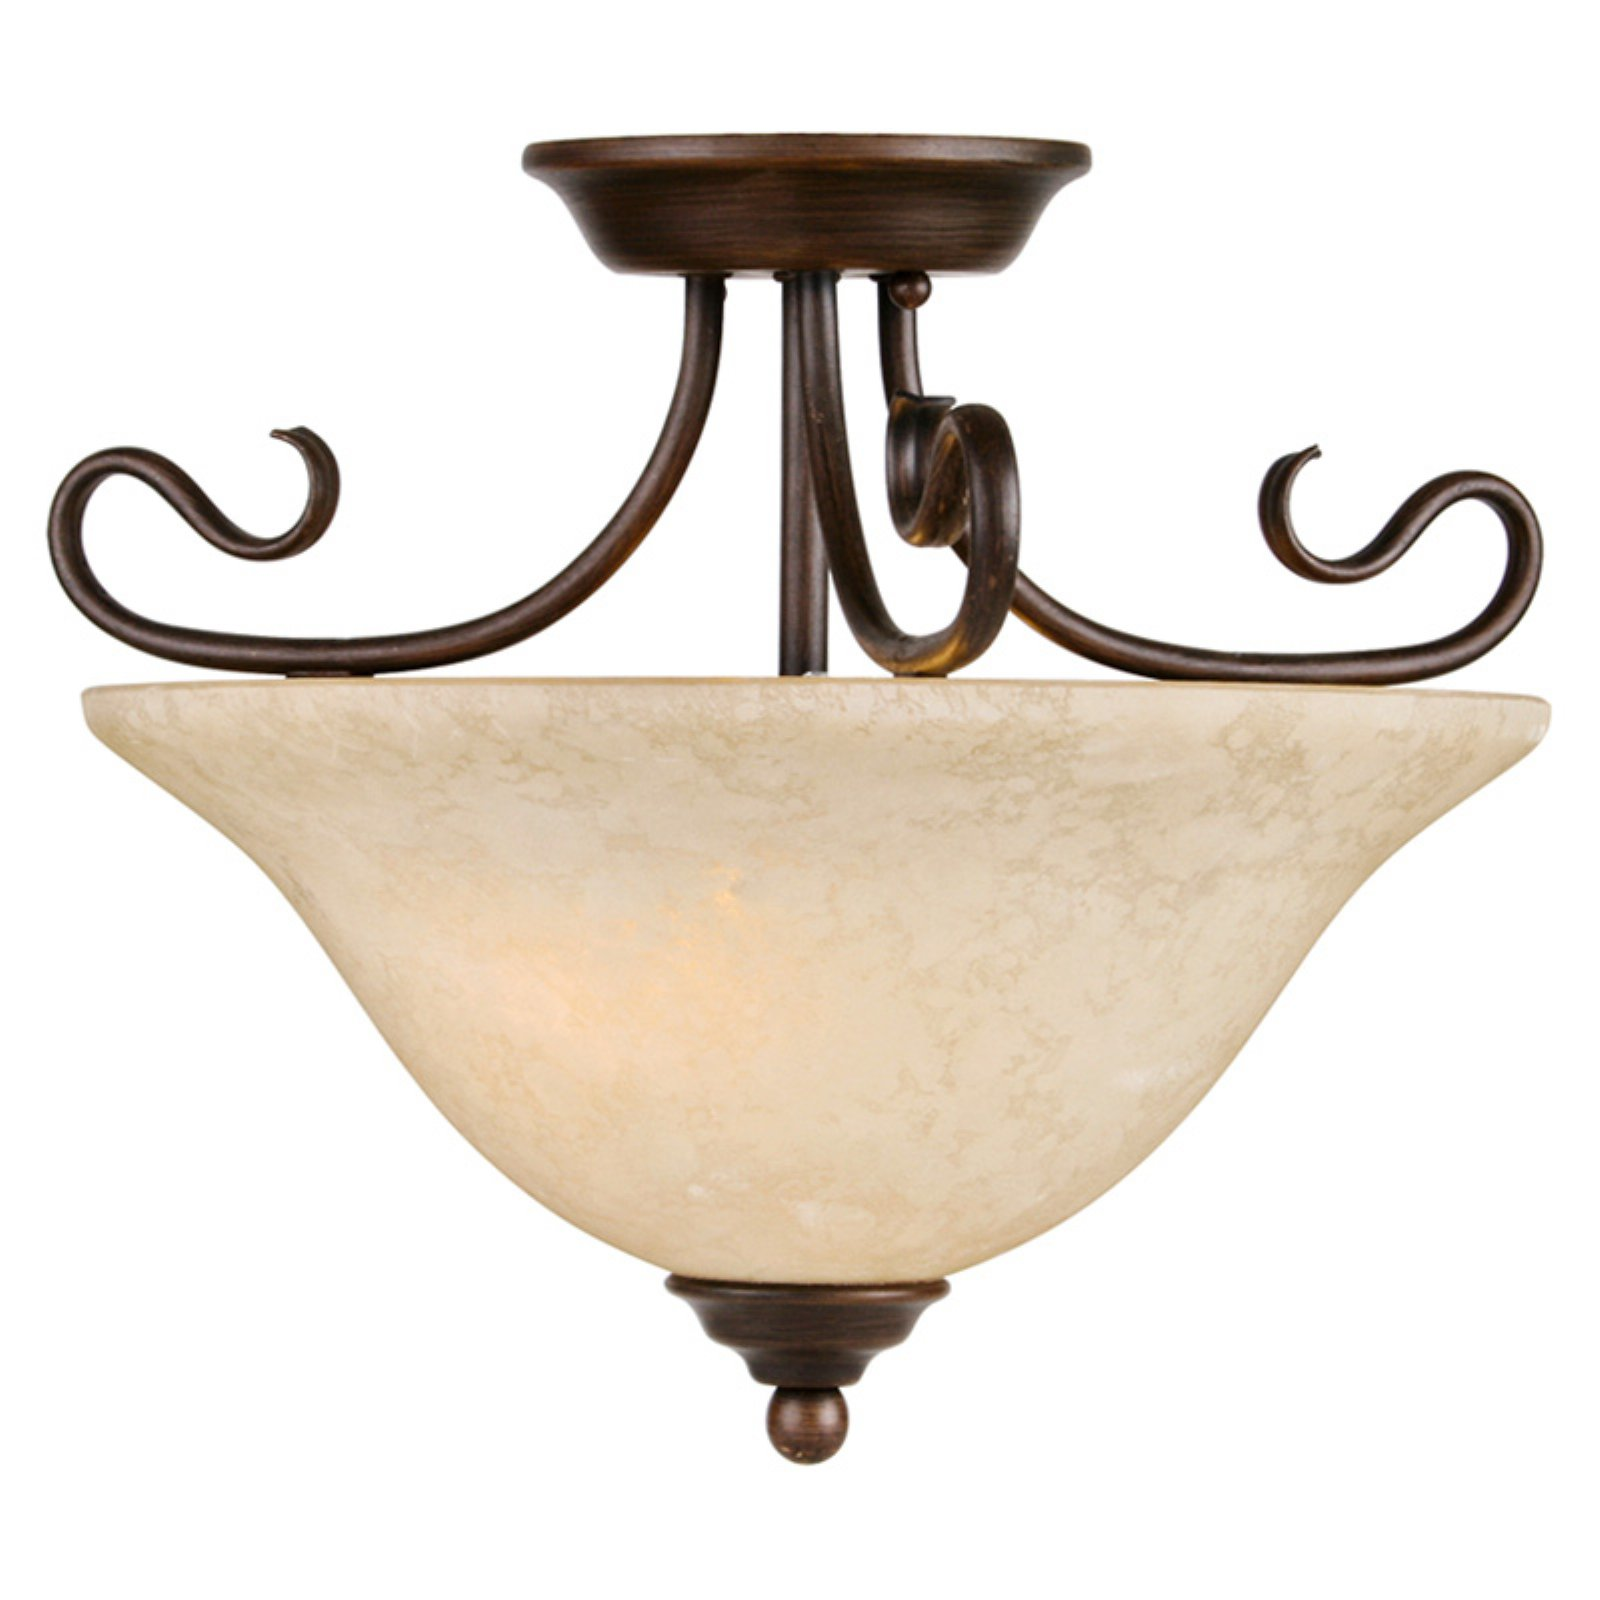 Livex Coronado 6121-58 15.5 Inch Ceiling Mount - Imperial Bronze